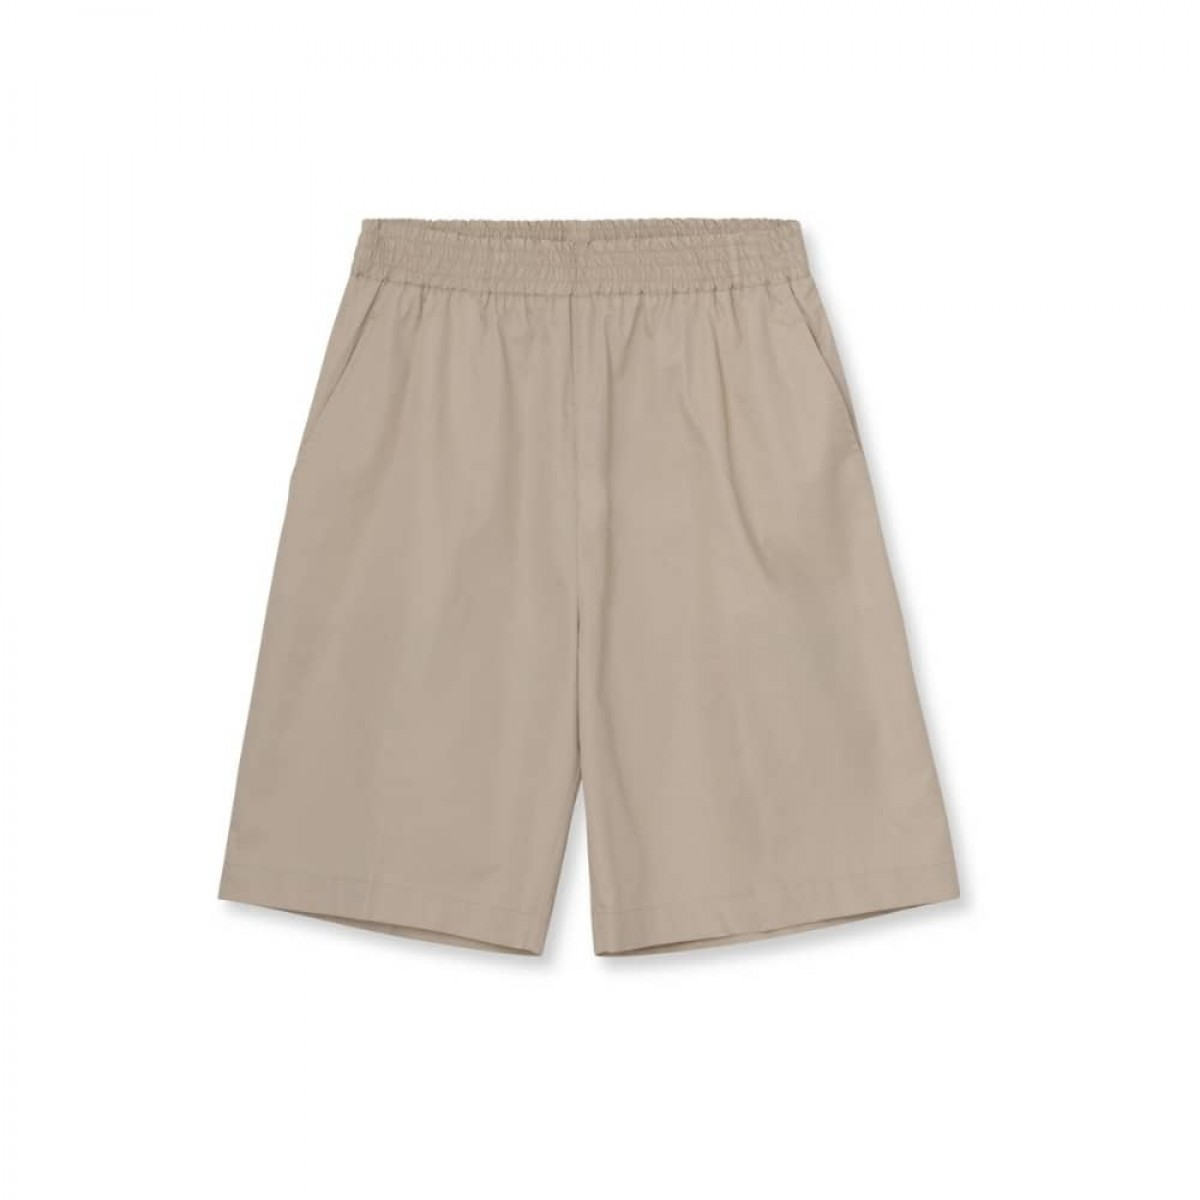 solo shorts - beige